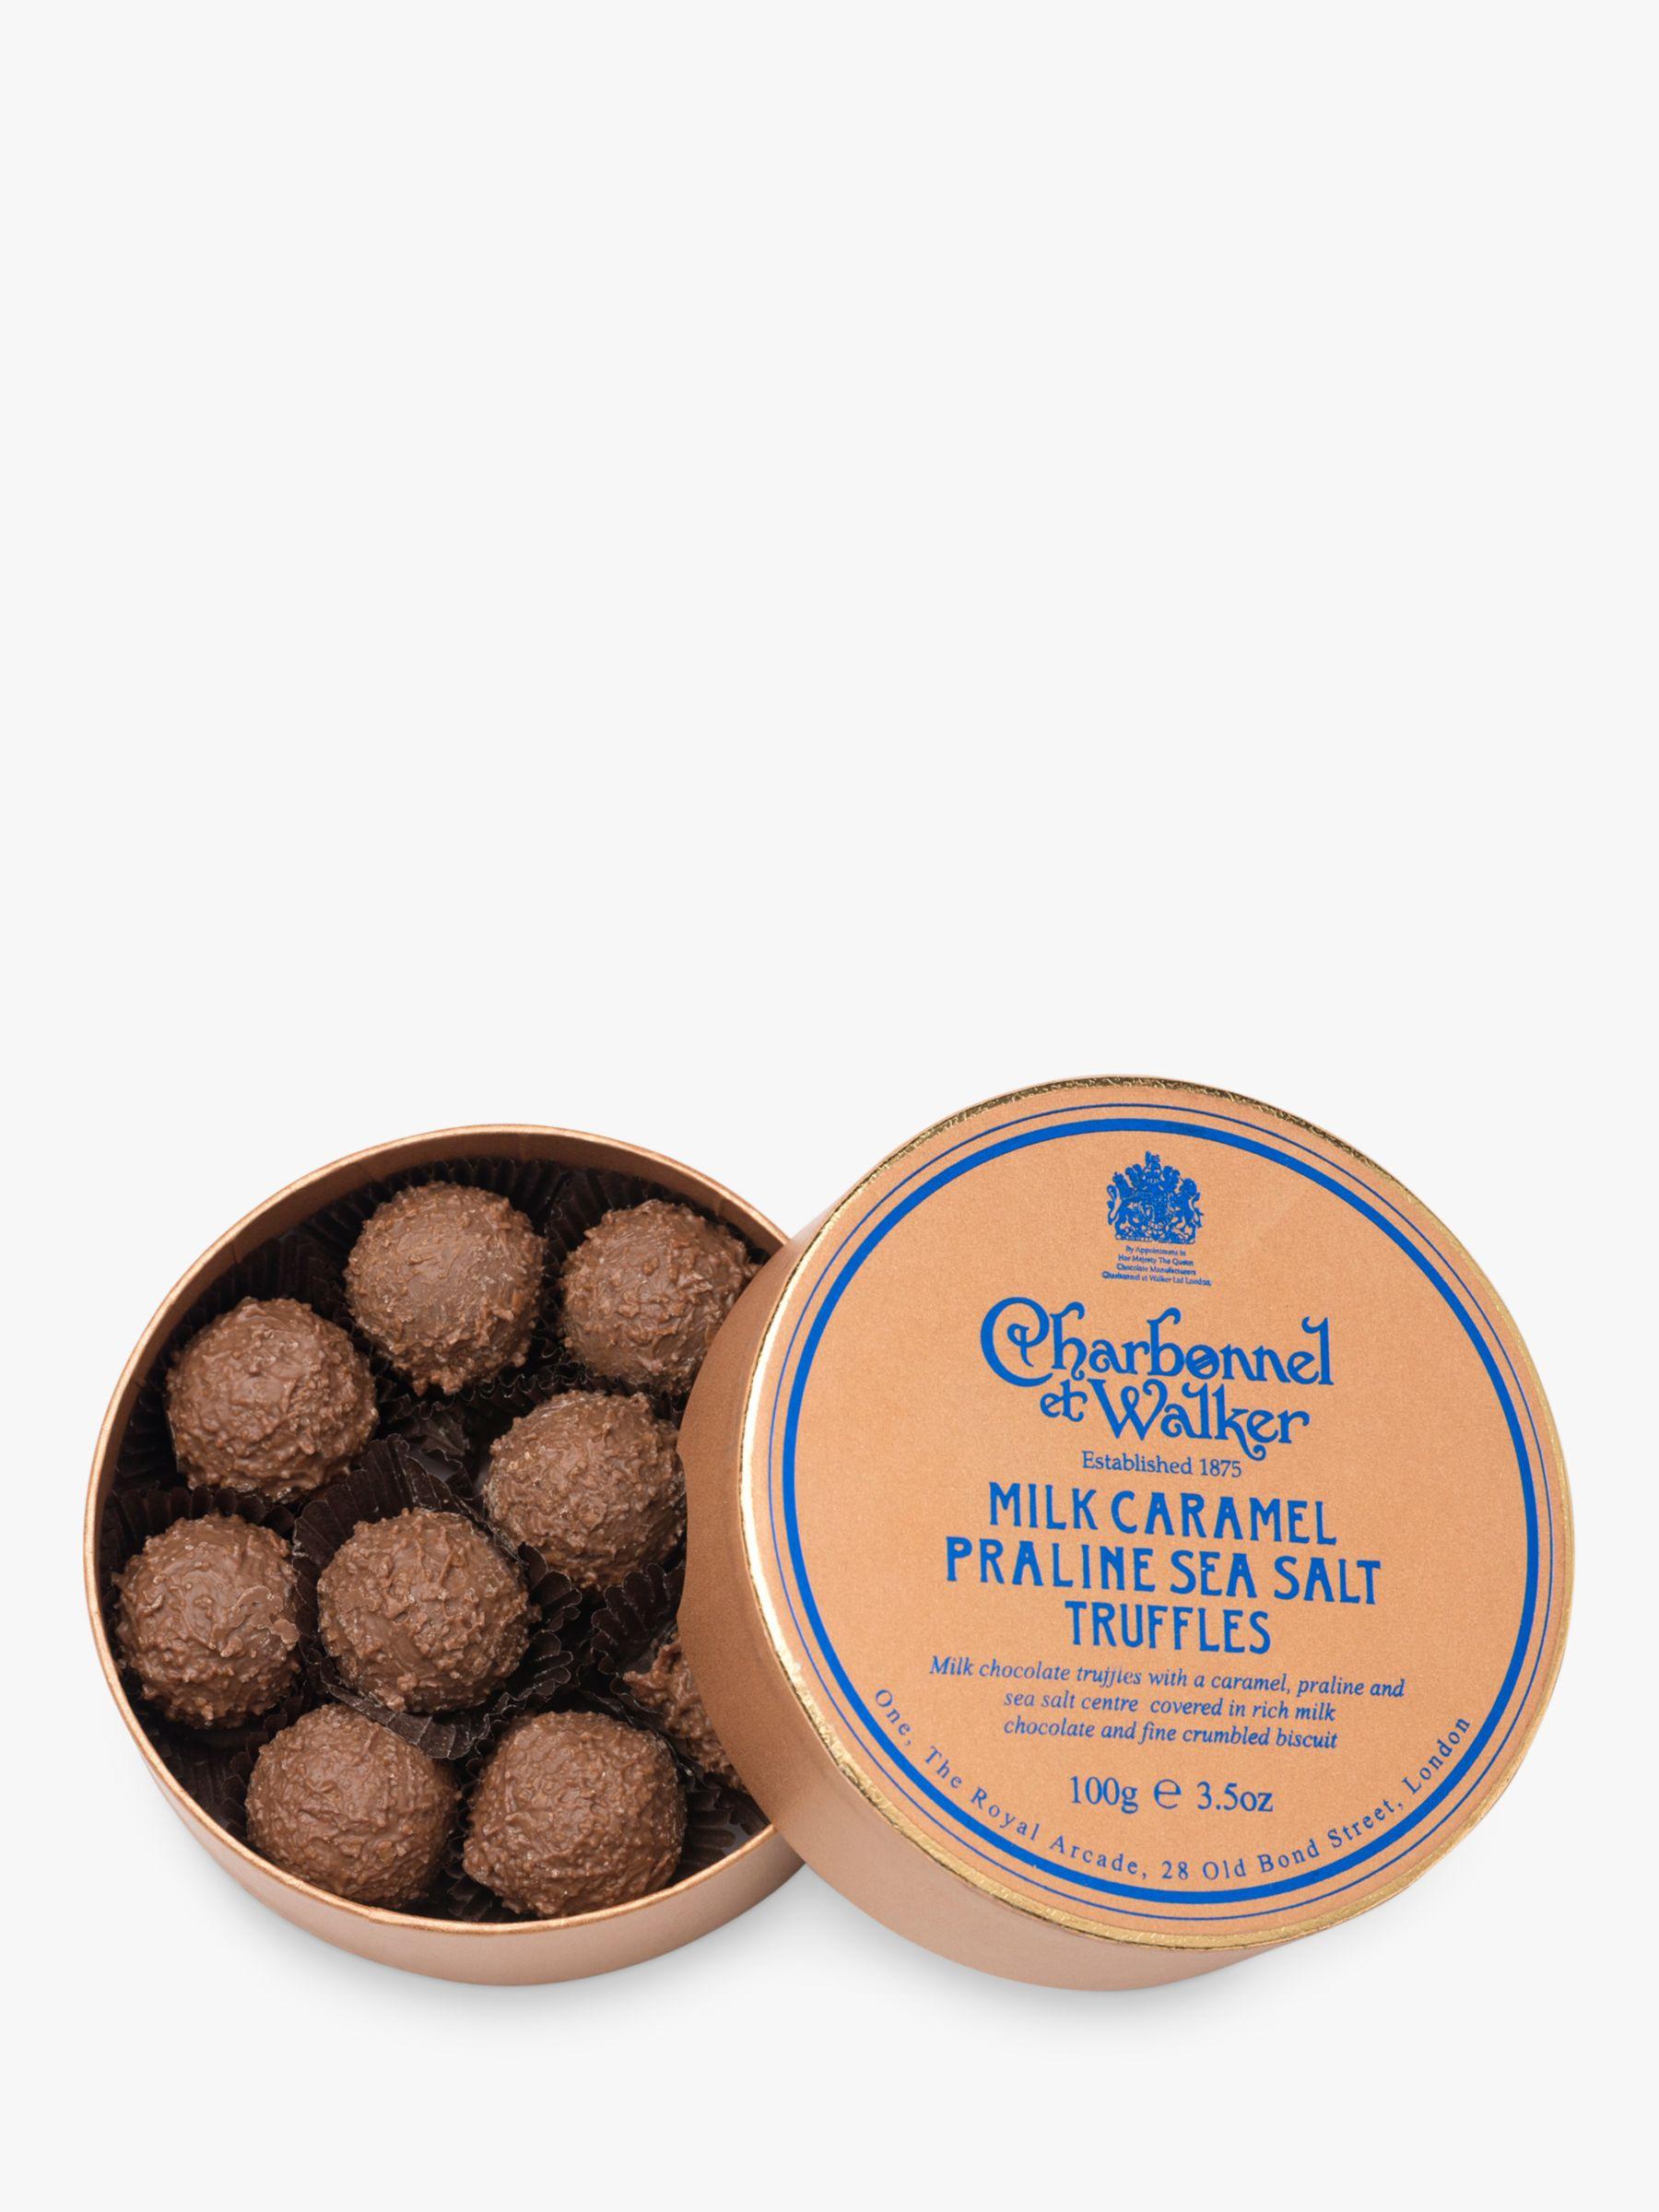 Charbonnel et Walker Charbonnel et Walker Milk Caramel Praline Truffles, 100g